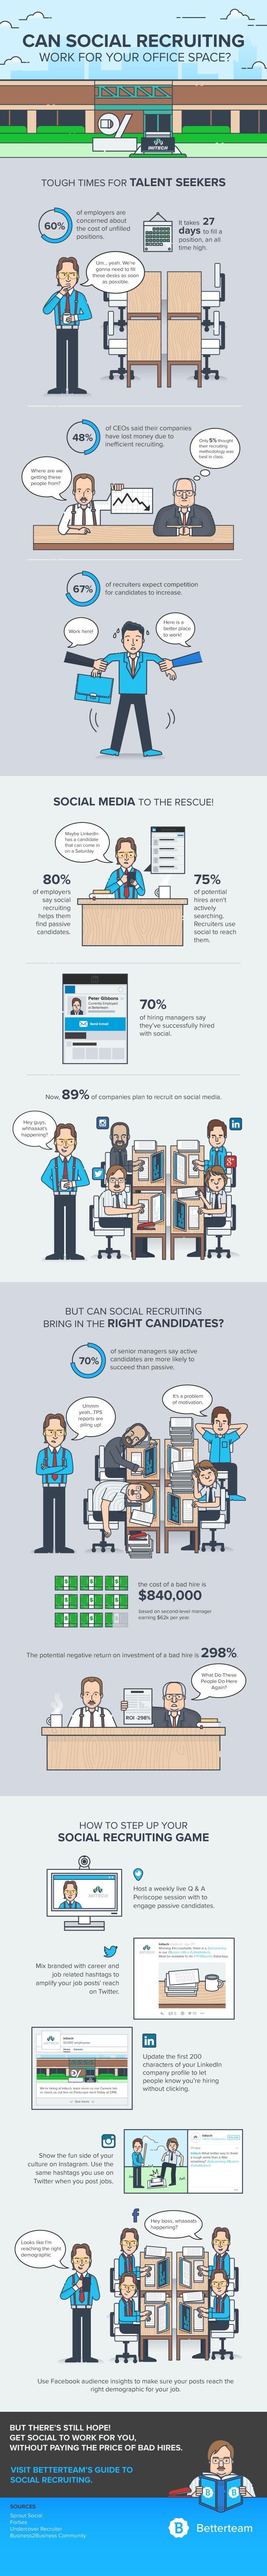 BetterTeam_social-recruiting-infographic.jpg